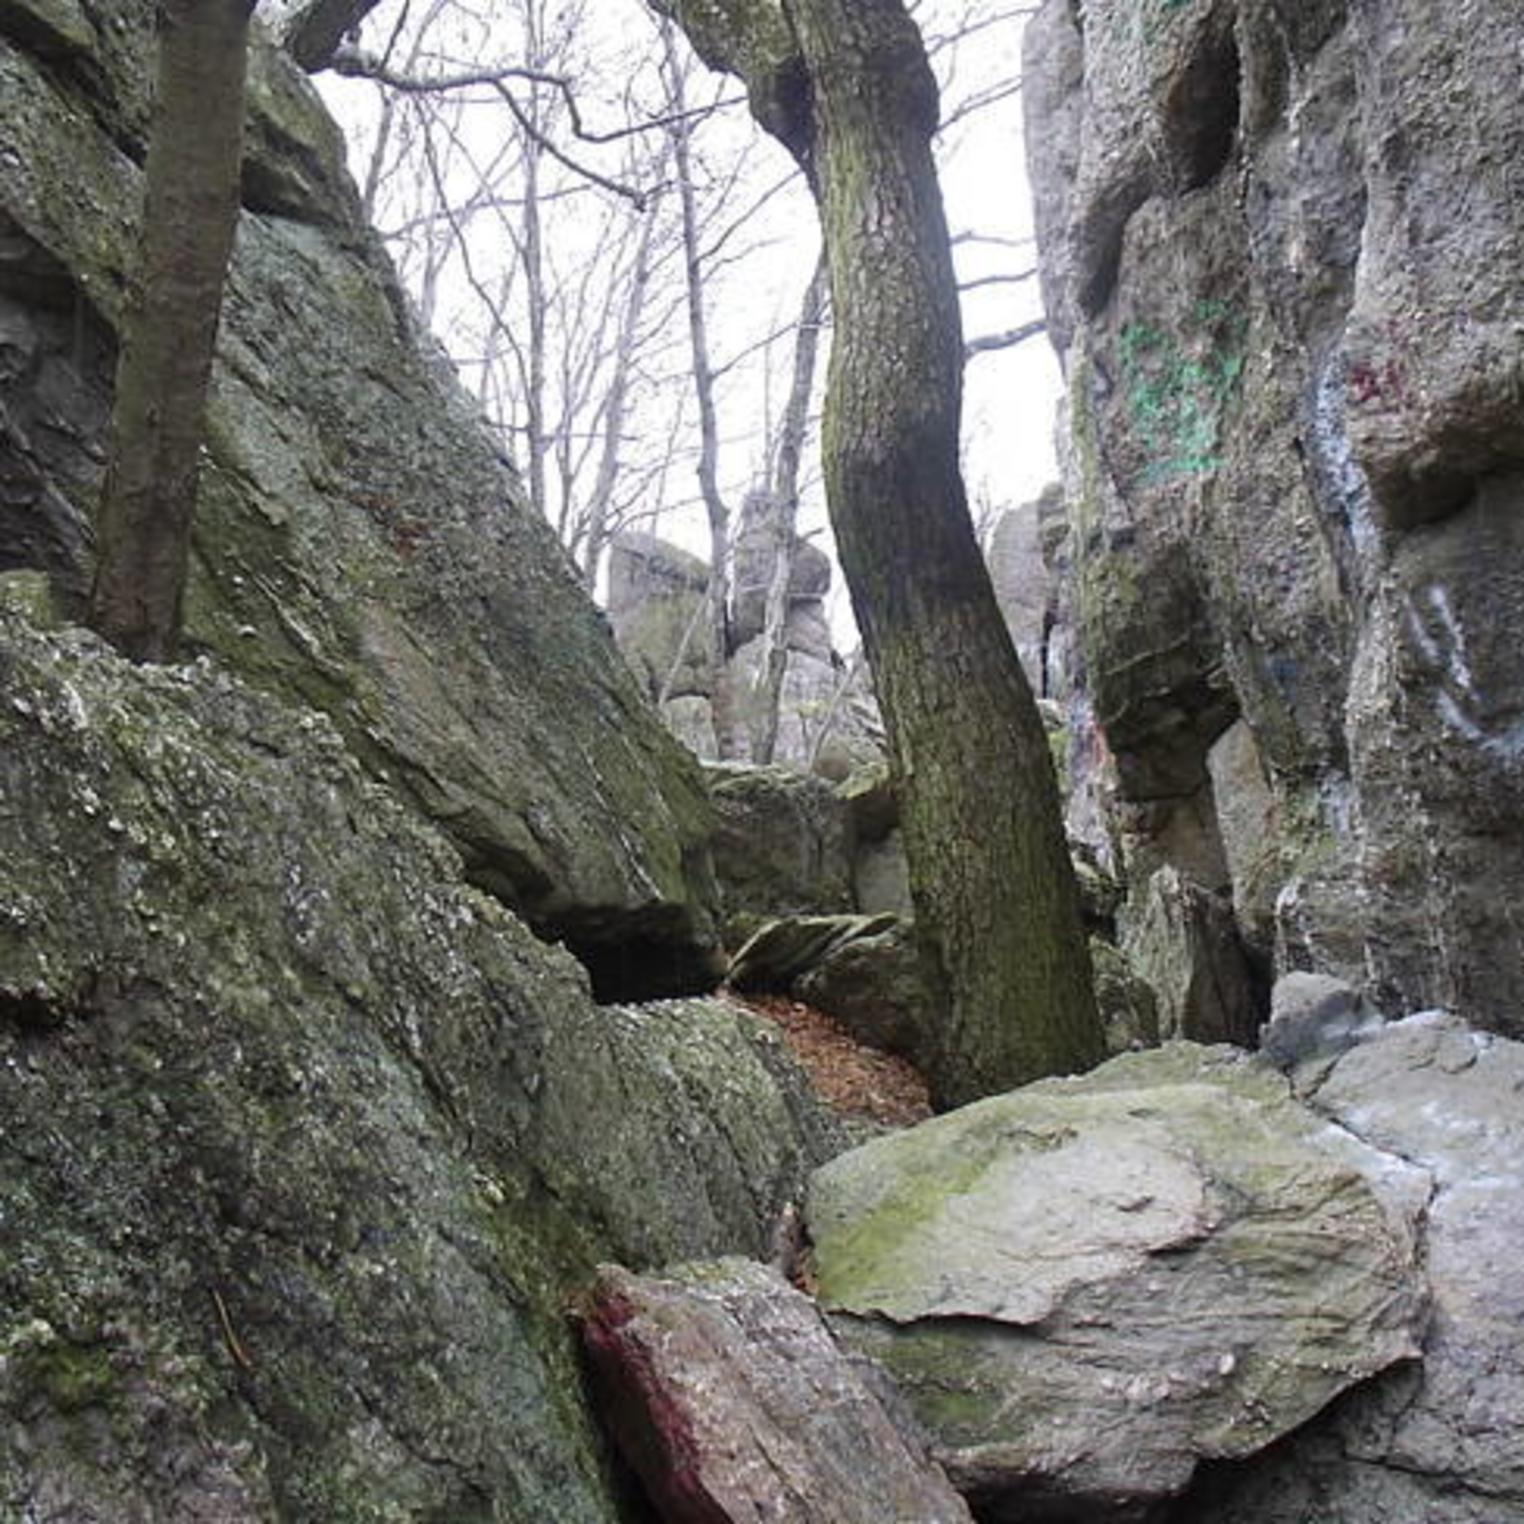 Hammonds Rocks in Michaux State Forest courtesy of summitpost.org